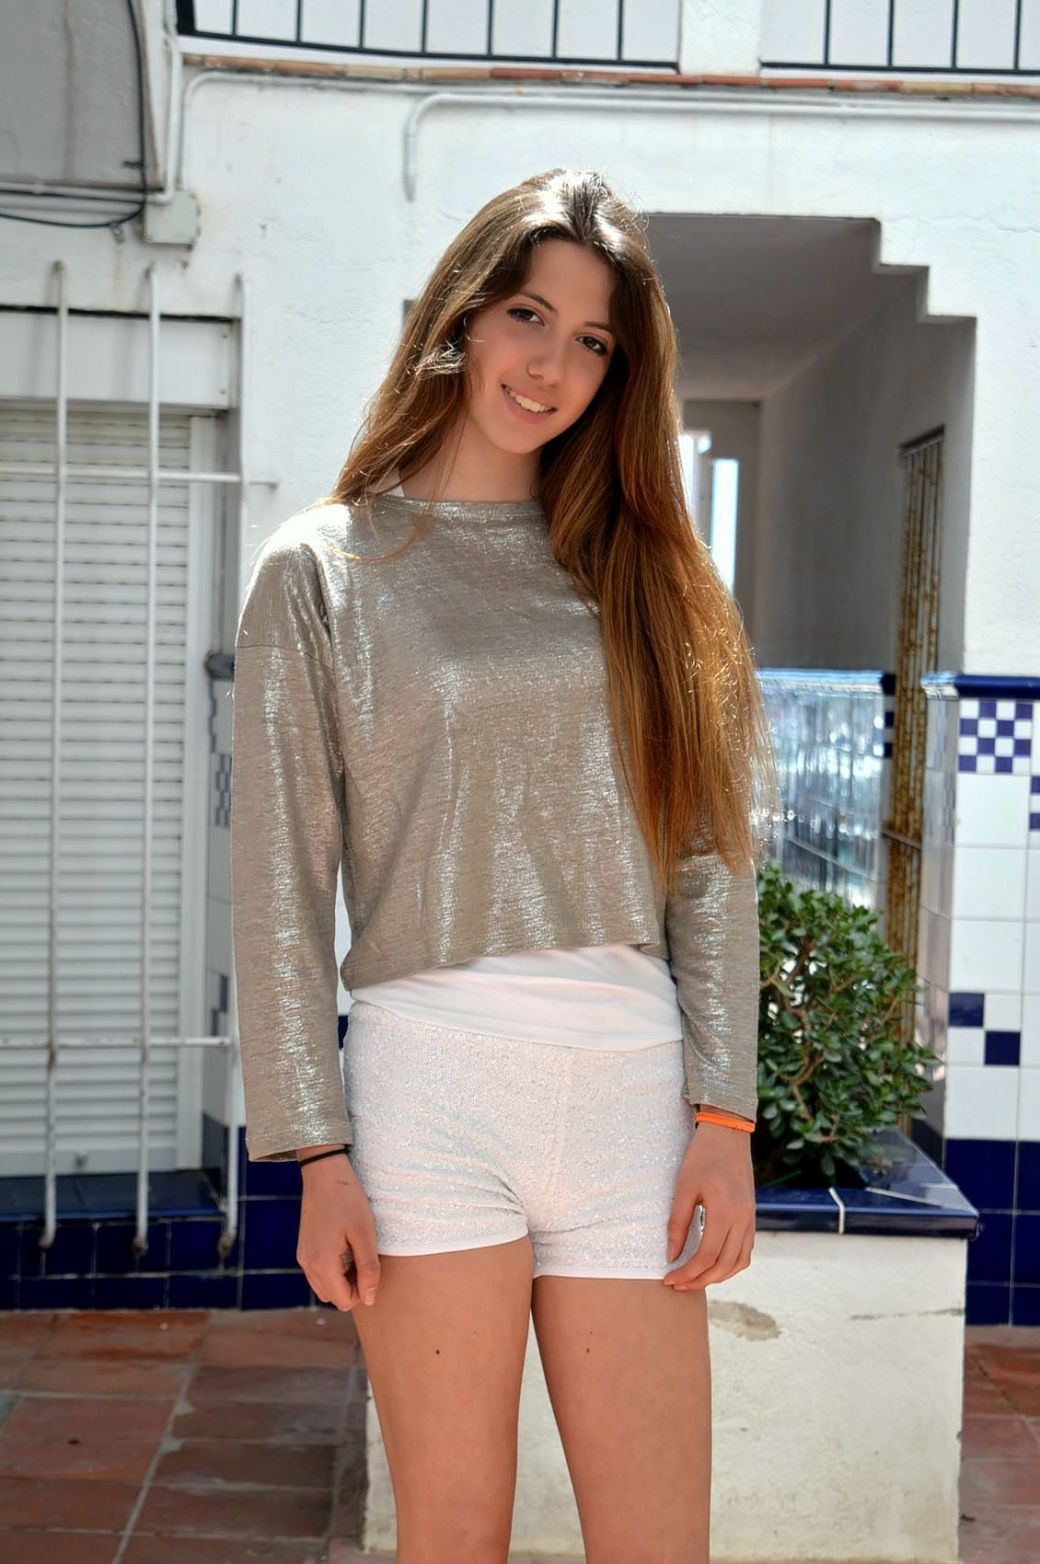 elisabeth puig begur tpl blog de moda infantil y juvenil (4)